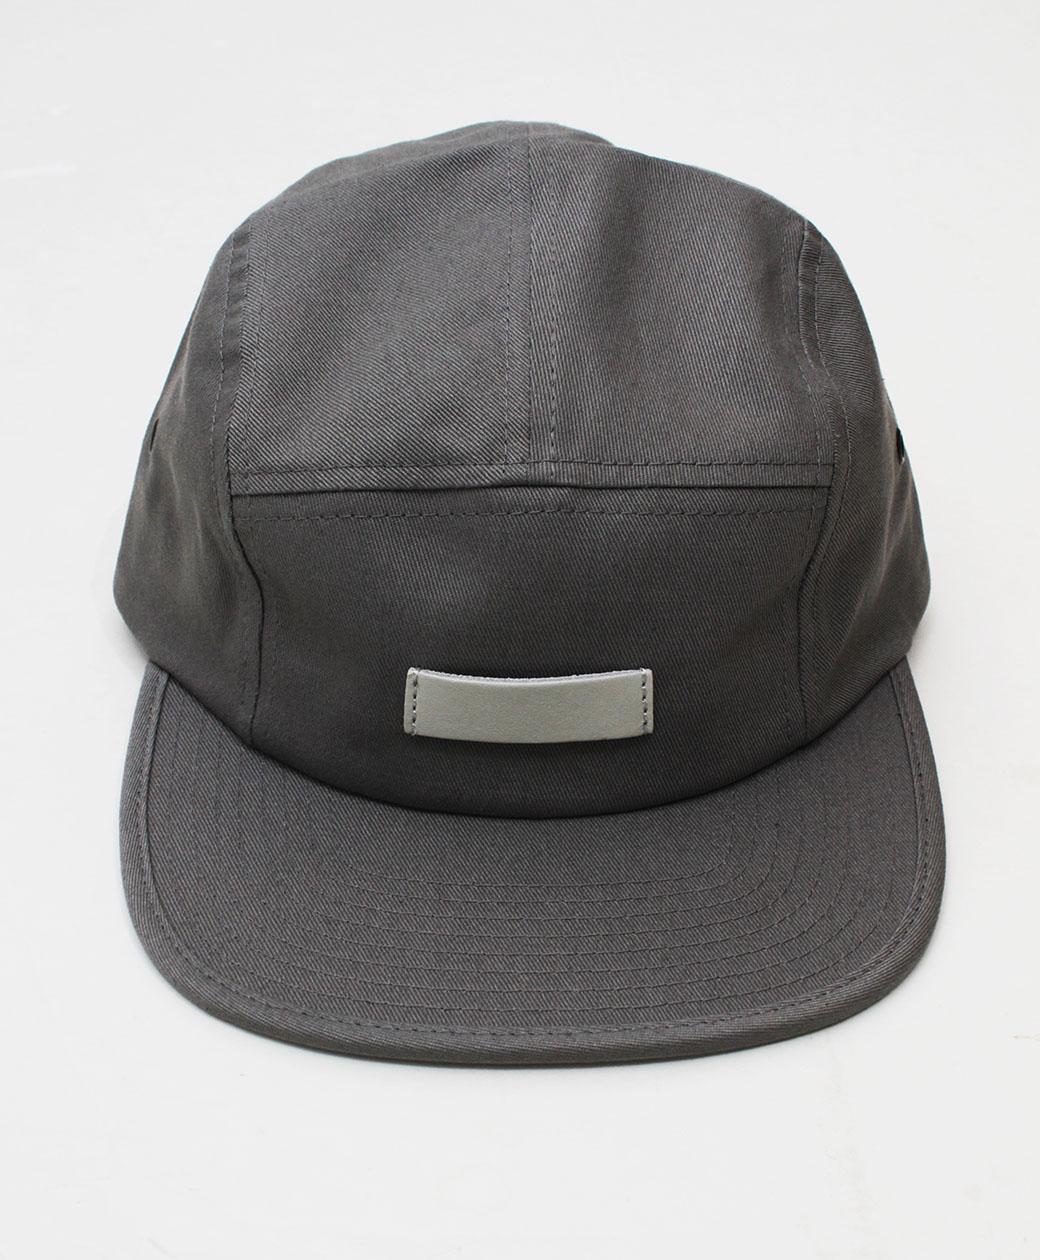 hobo COTTON TWILL JET CAP(GRAY)